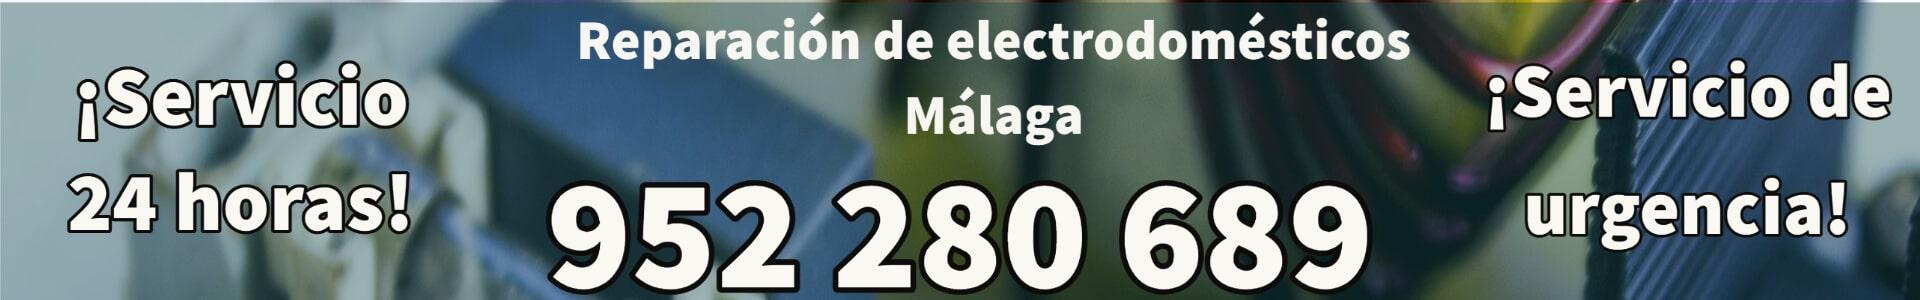 Reparación de Electrodomésticos Málaga